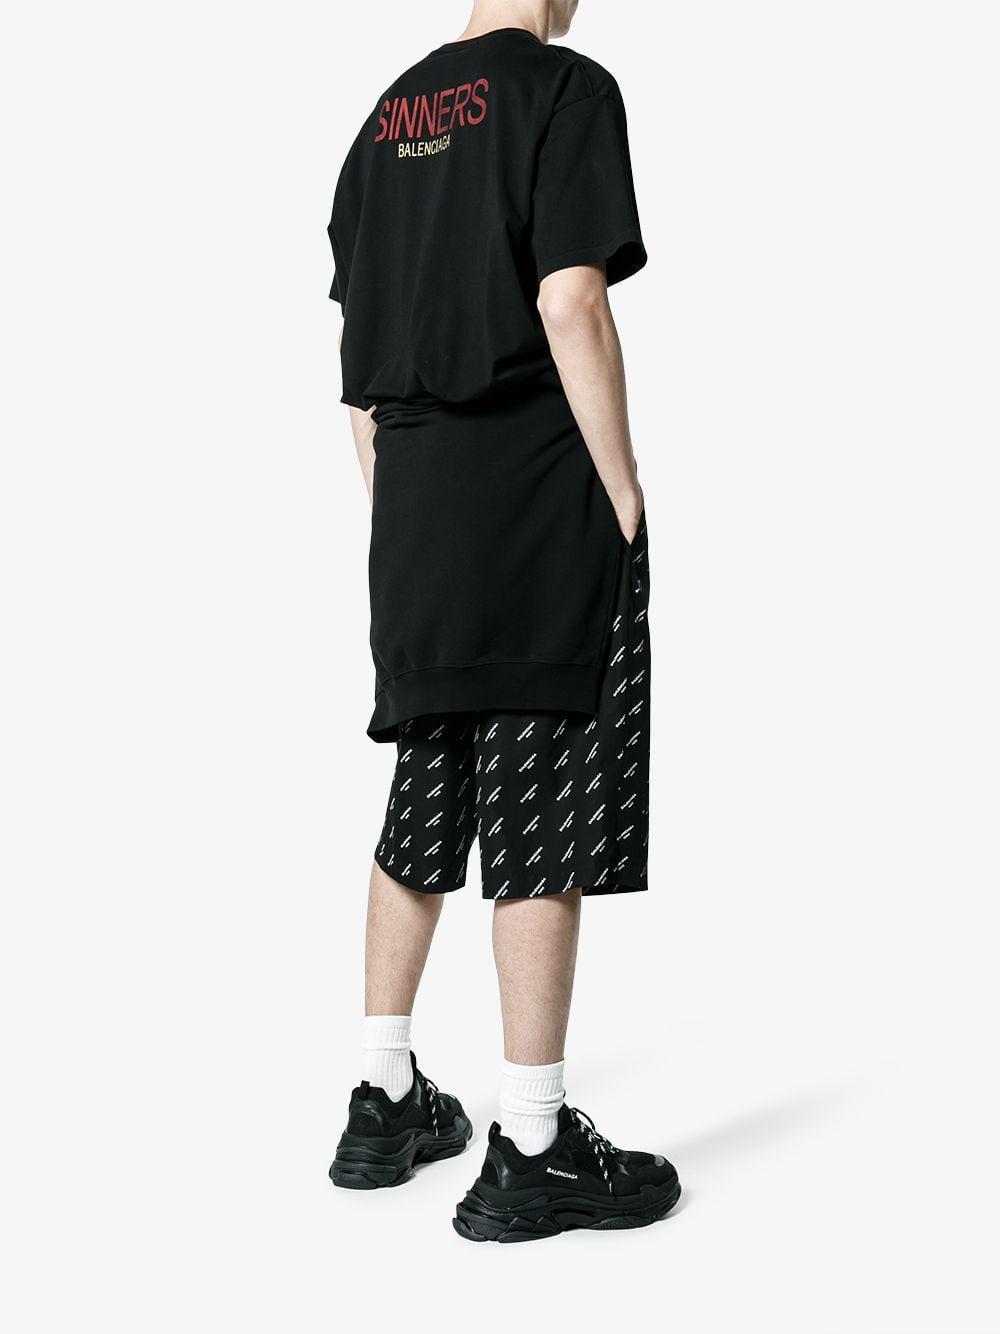 e4048812c743 Balenciaga Sinners T-shirt in Black for Men - Lyst